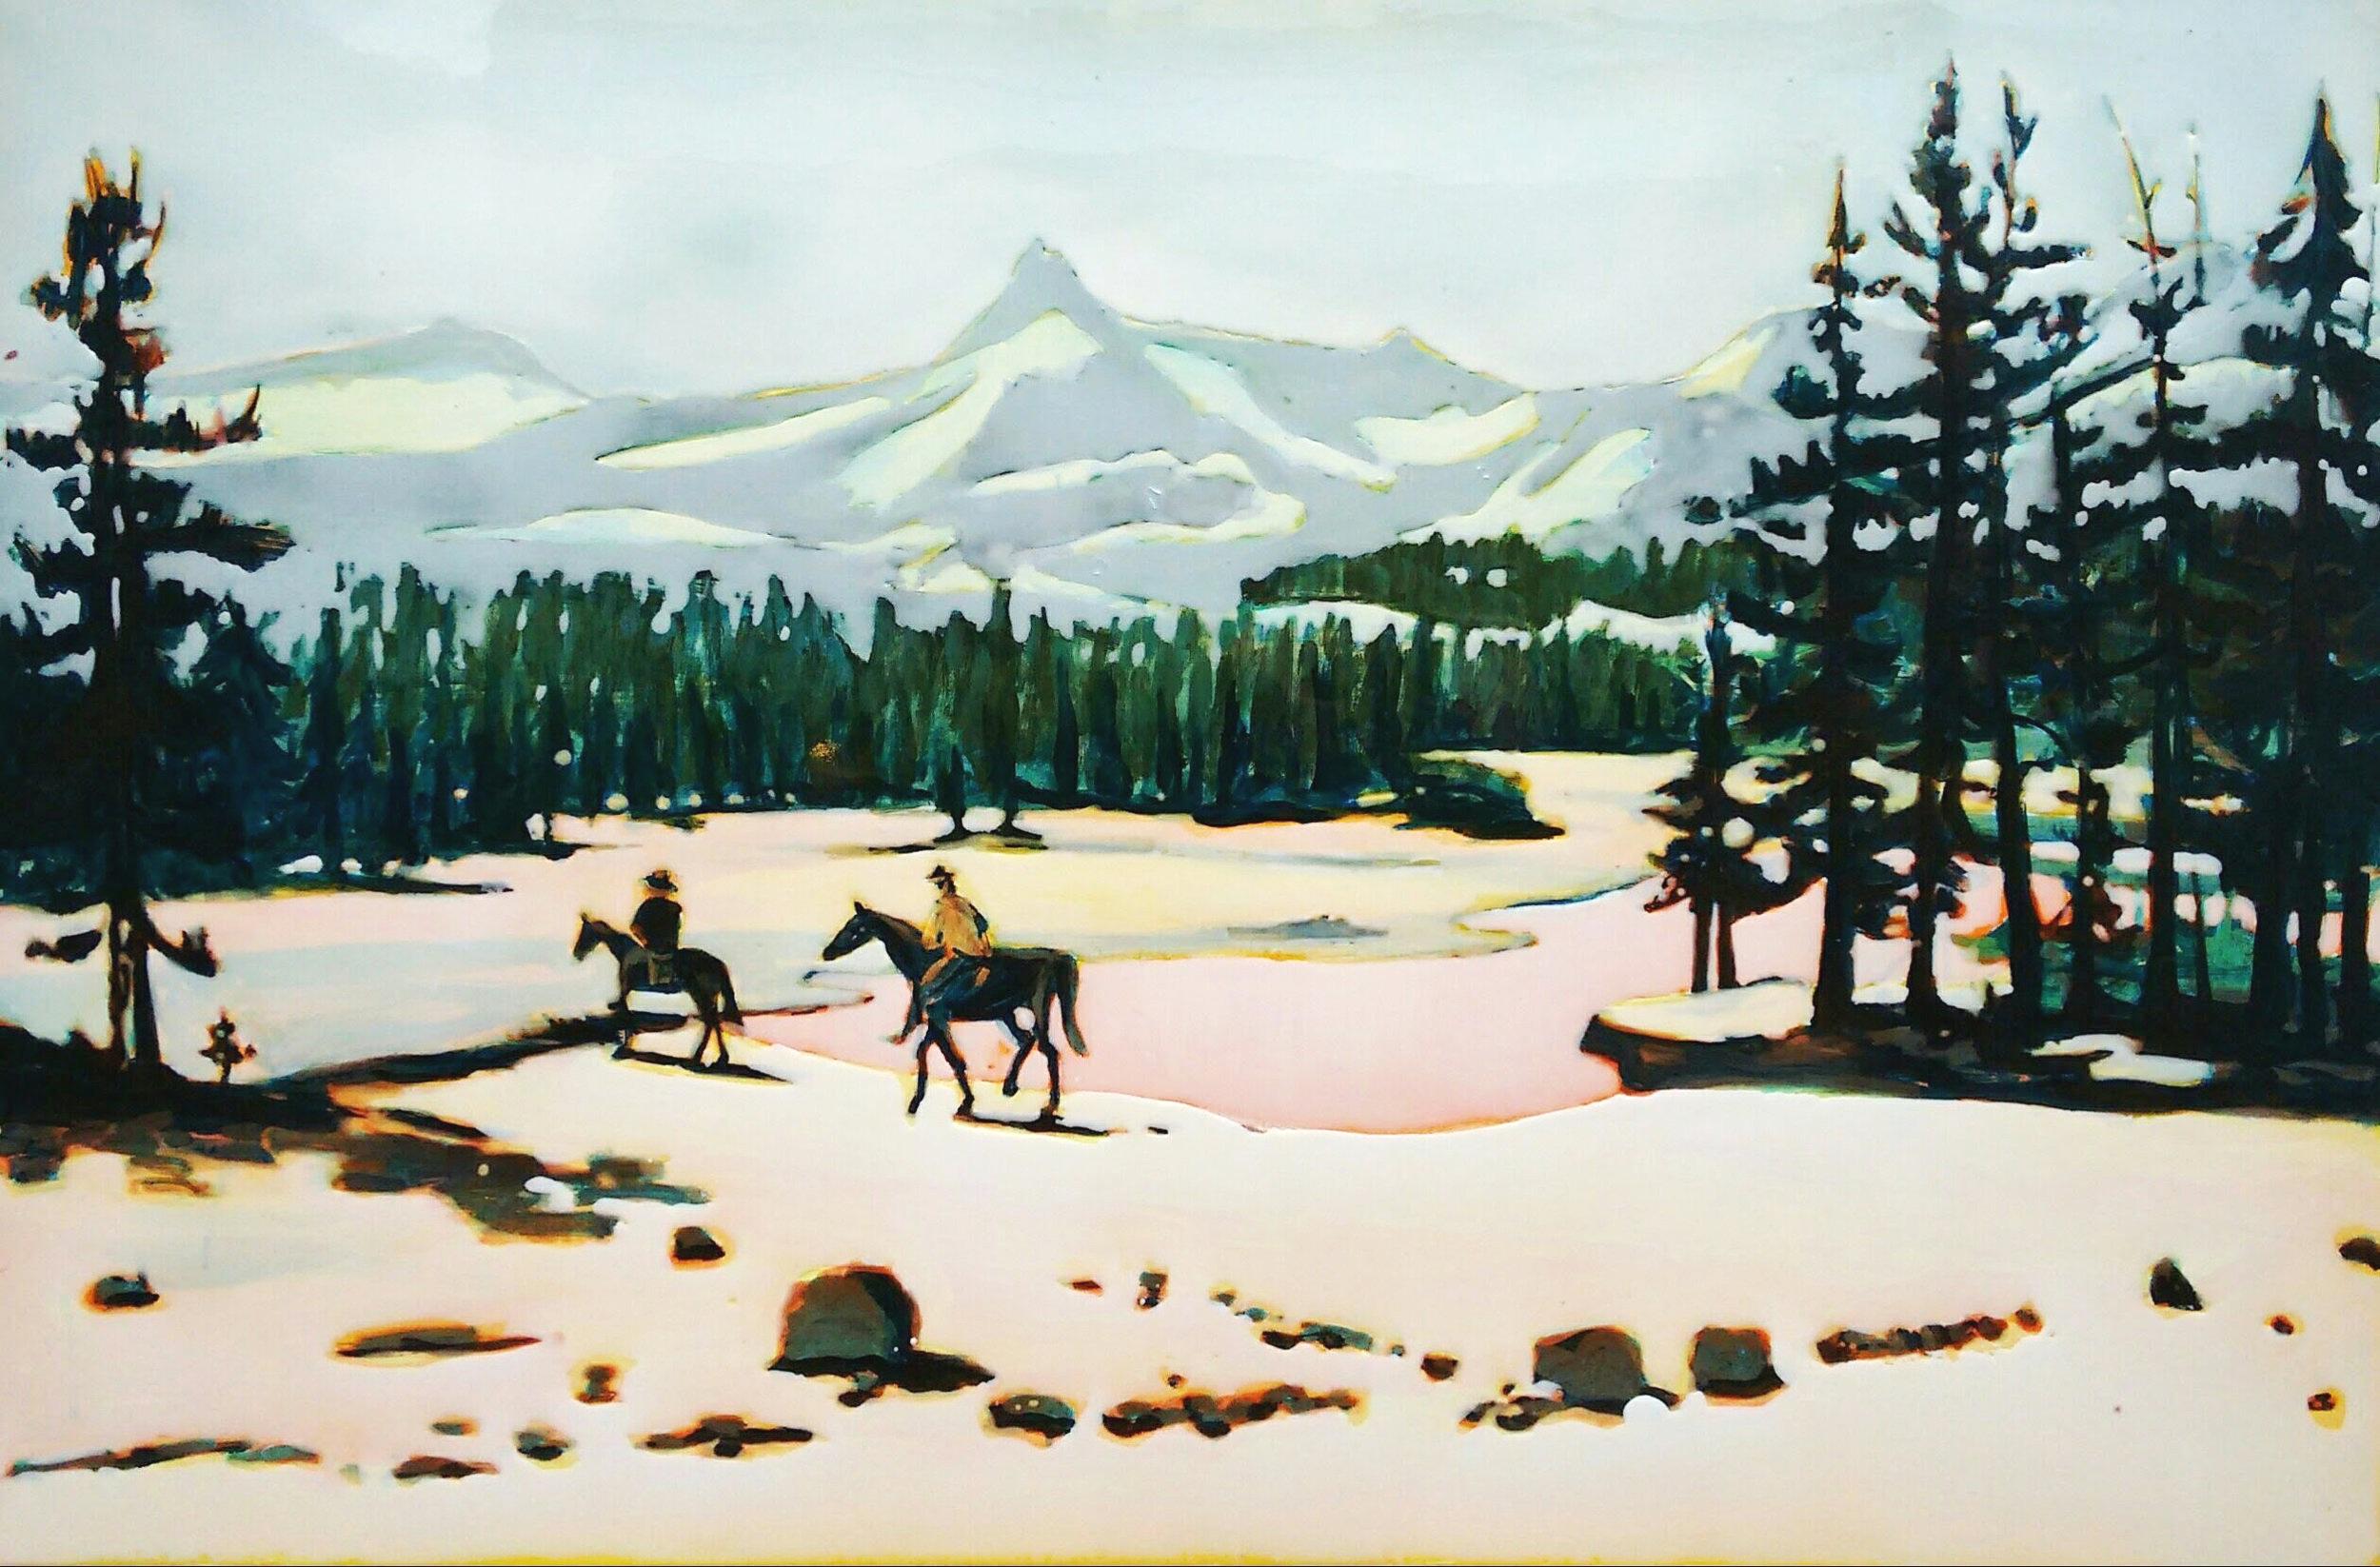 TUOLUMNE RIVER  150 x 80cm Acrylic and epoxy on canvas  Sold